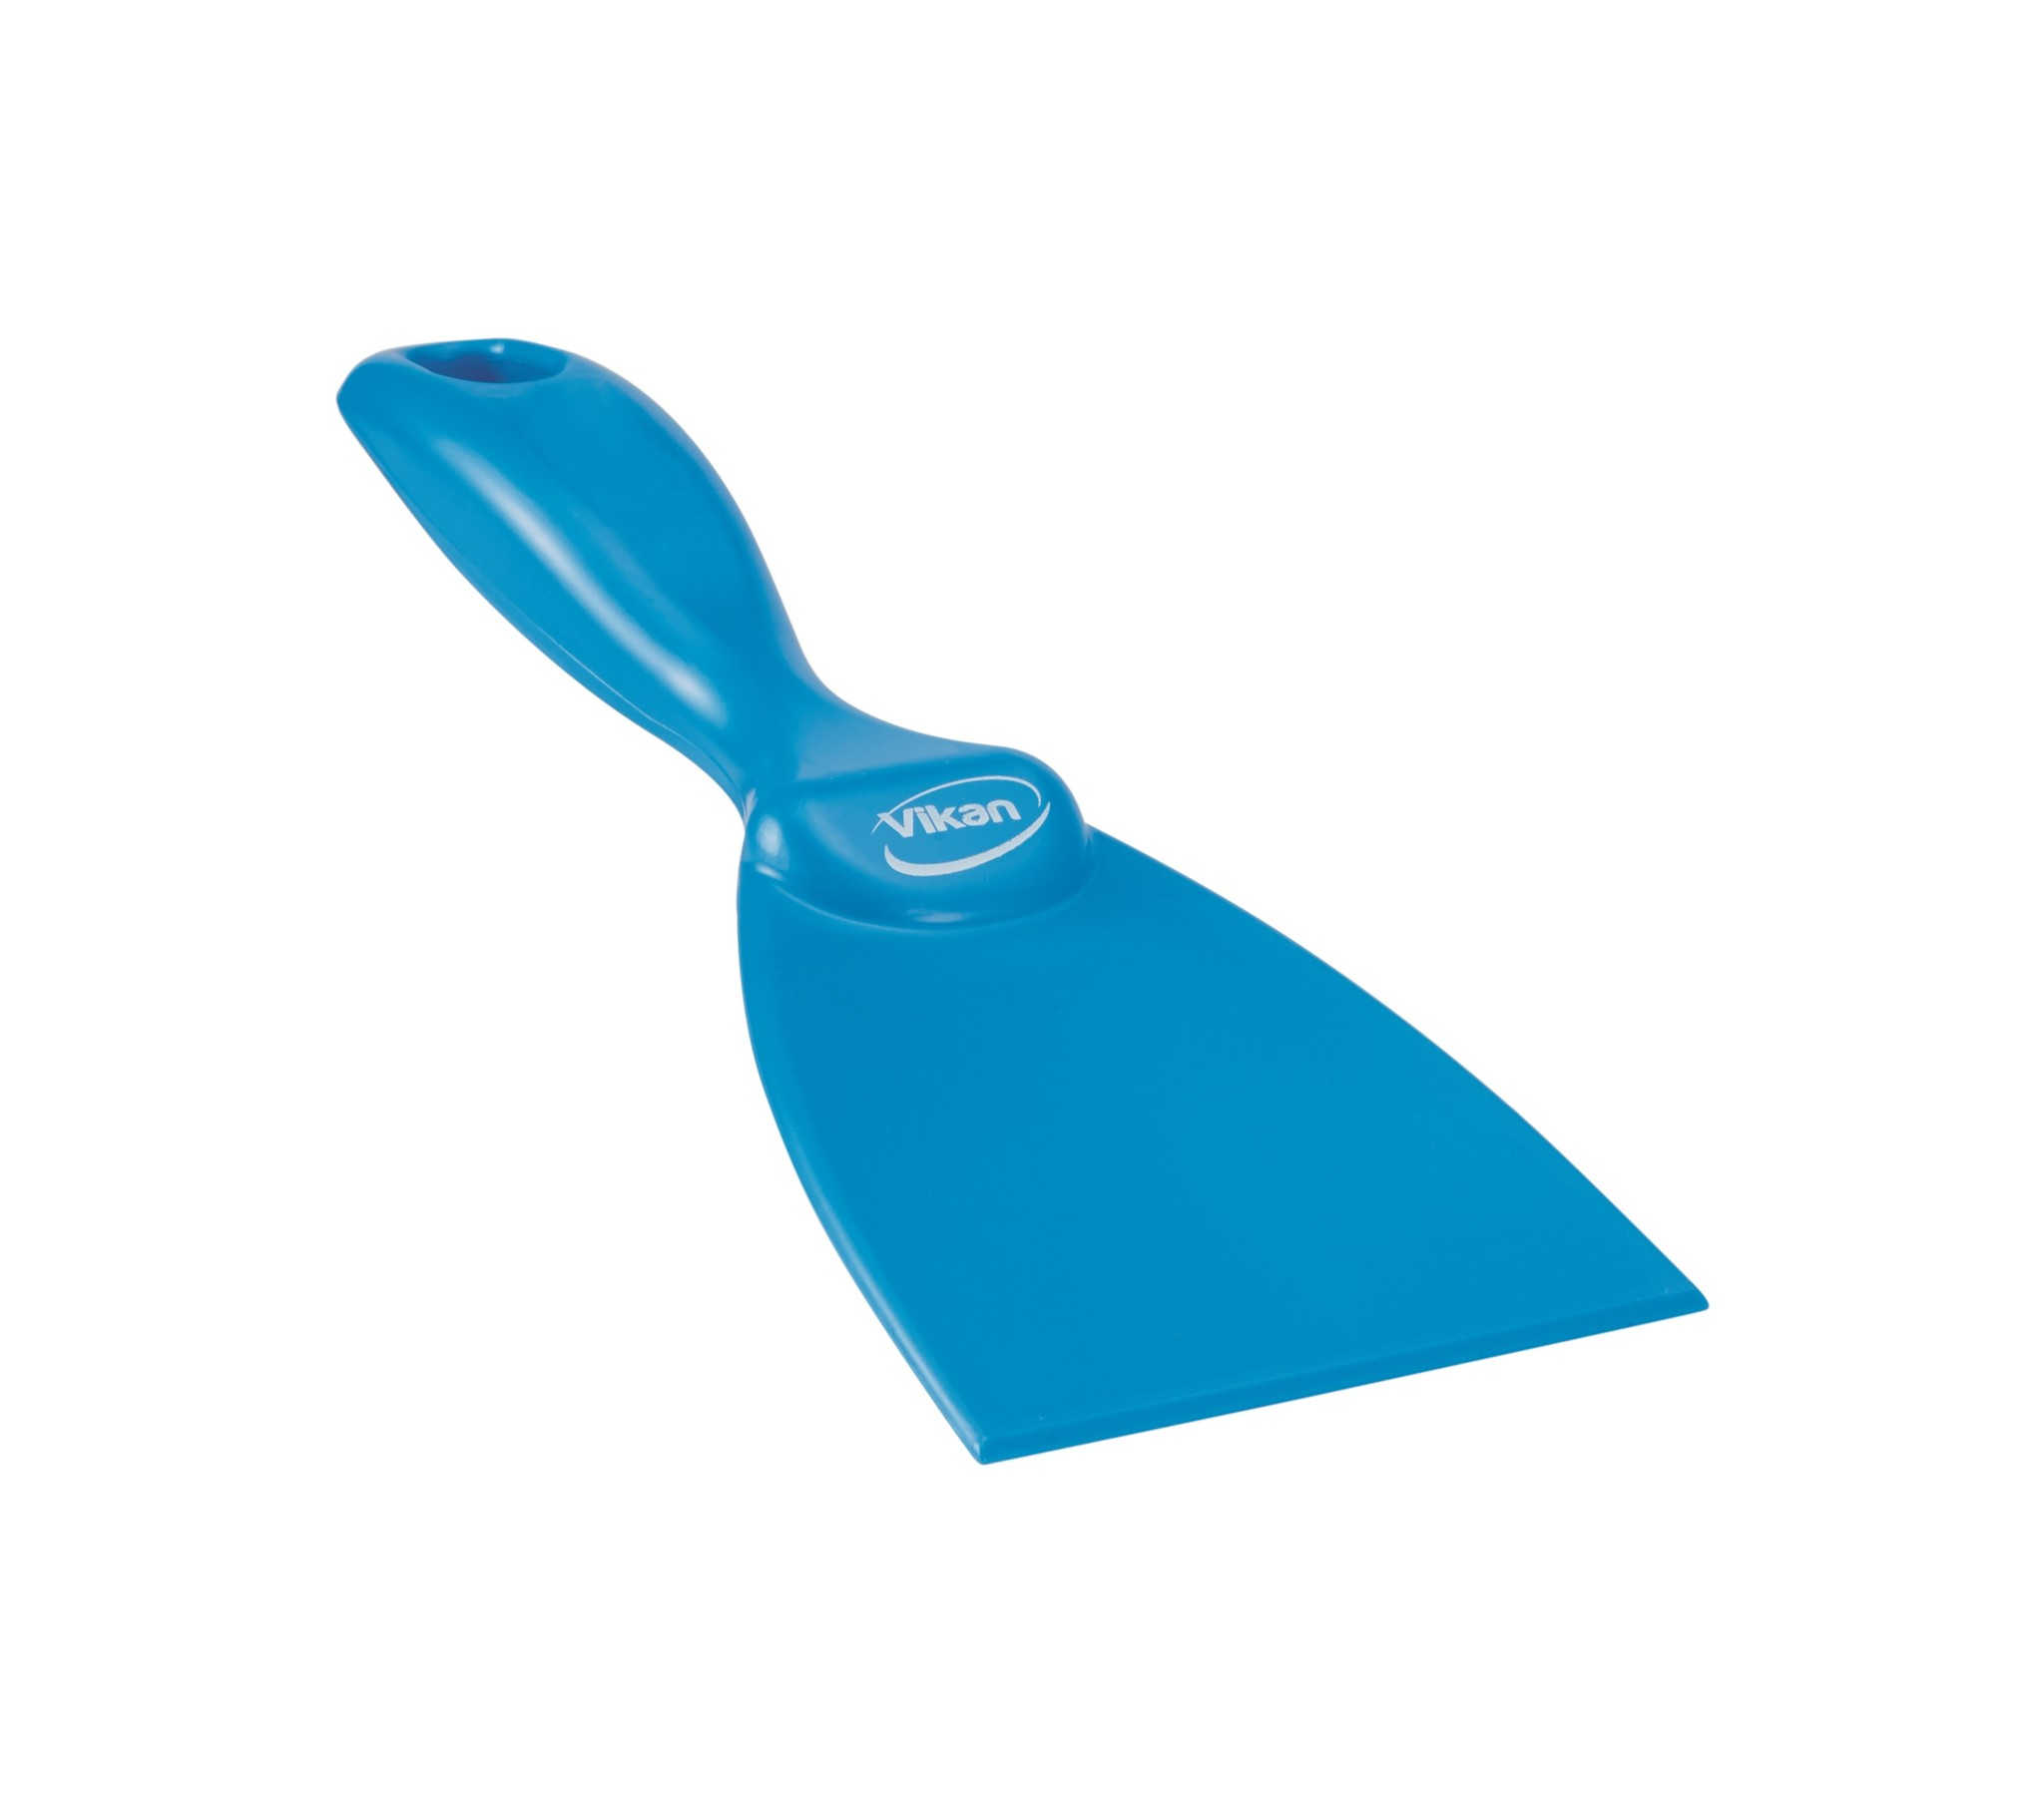 Vikan Hand scraper 75 x 210 mm, blue